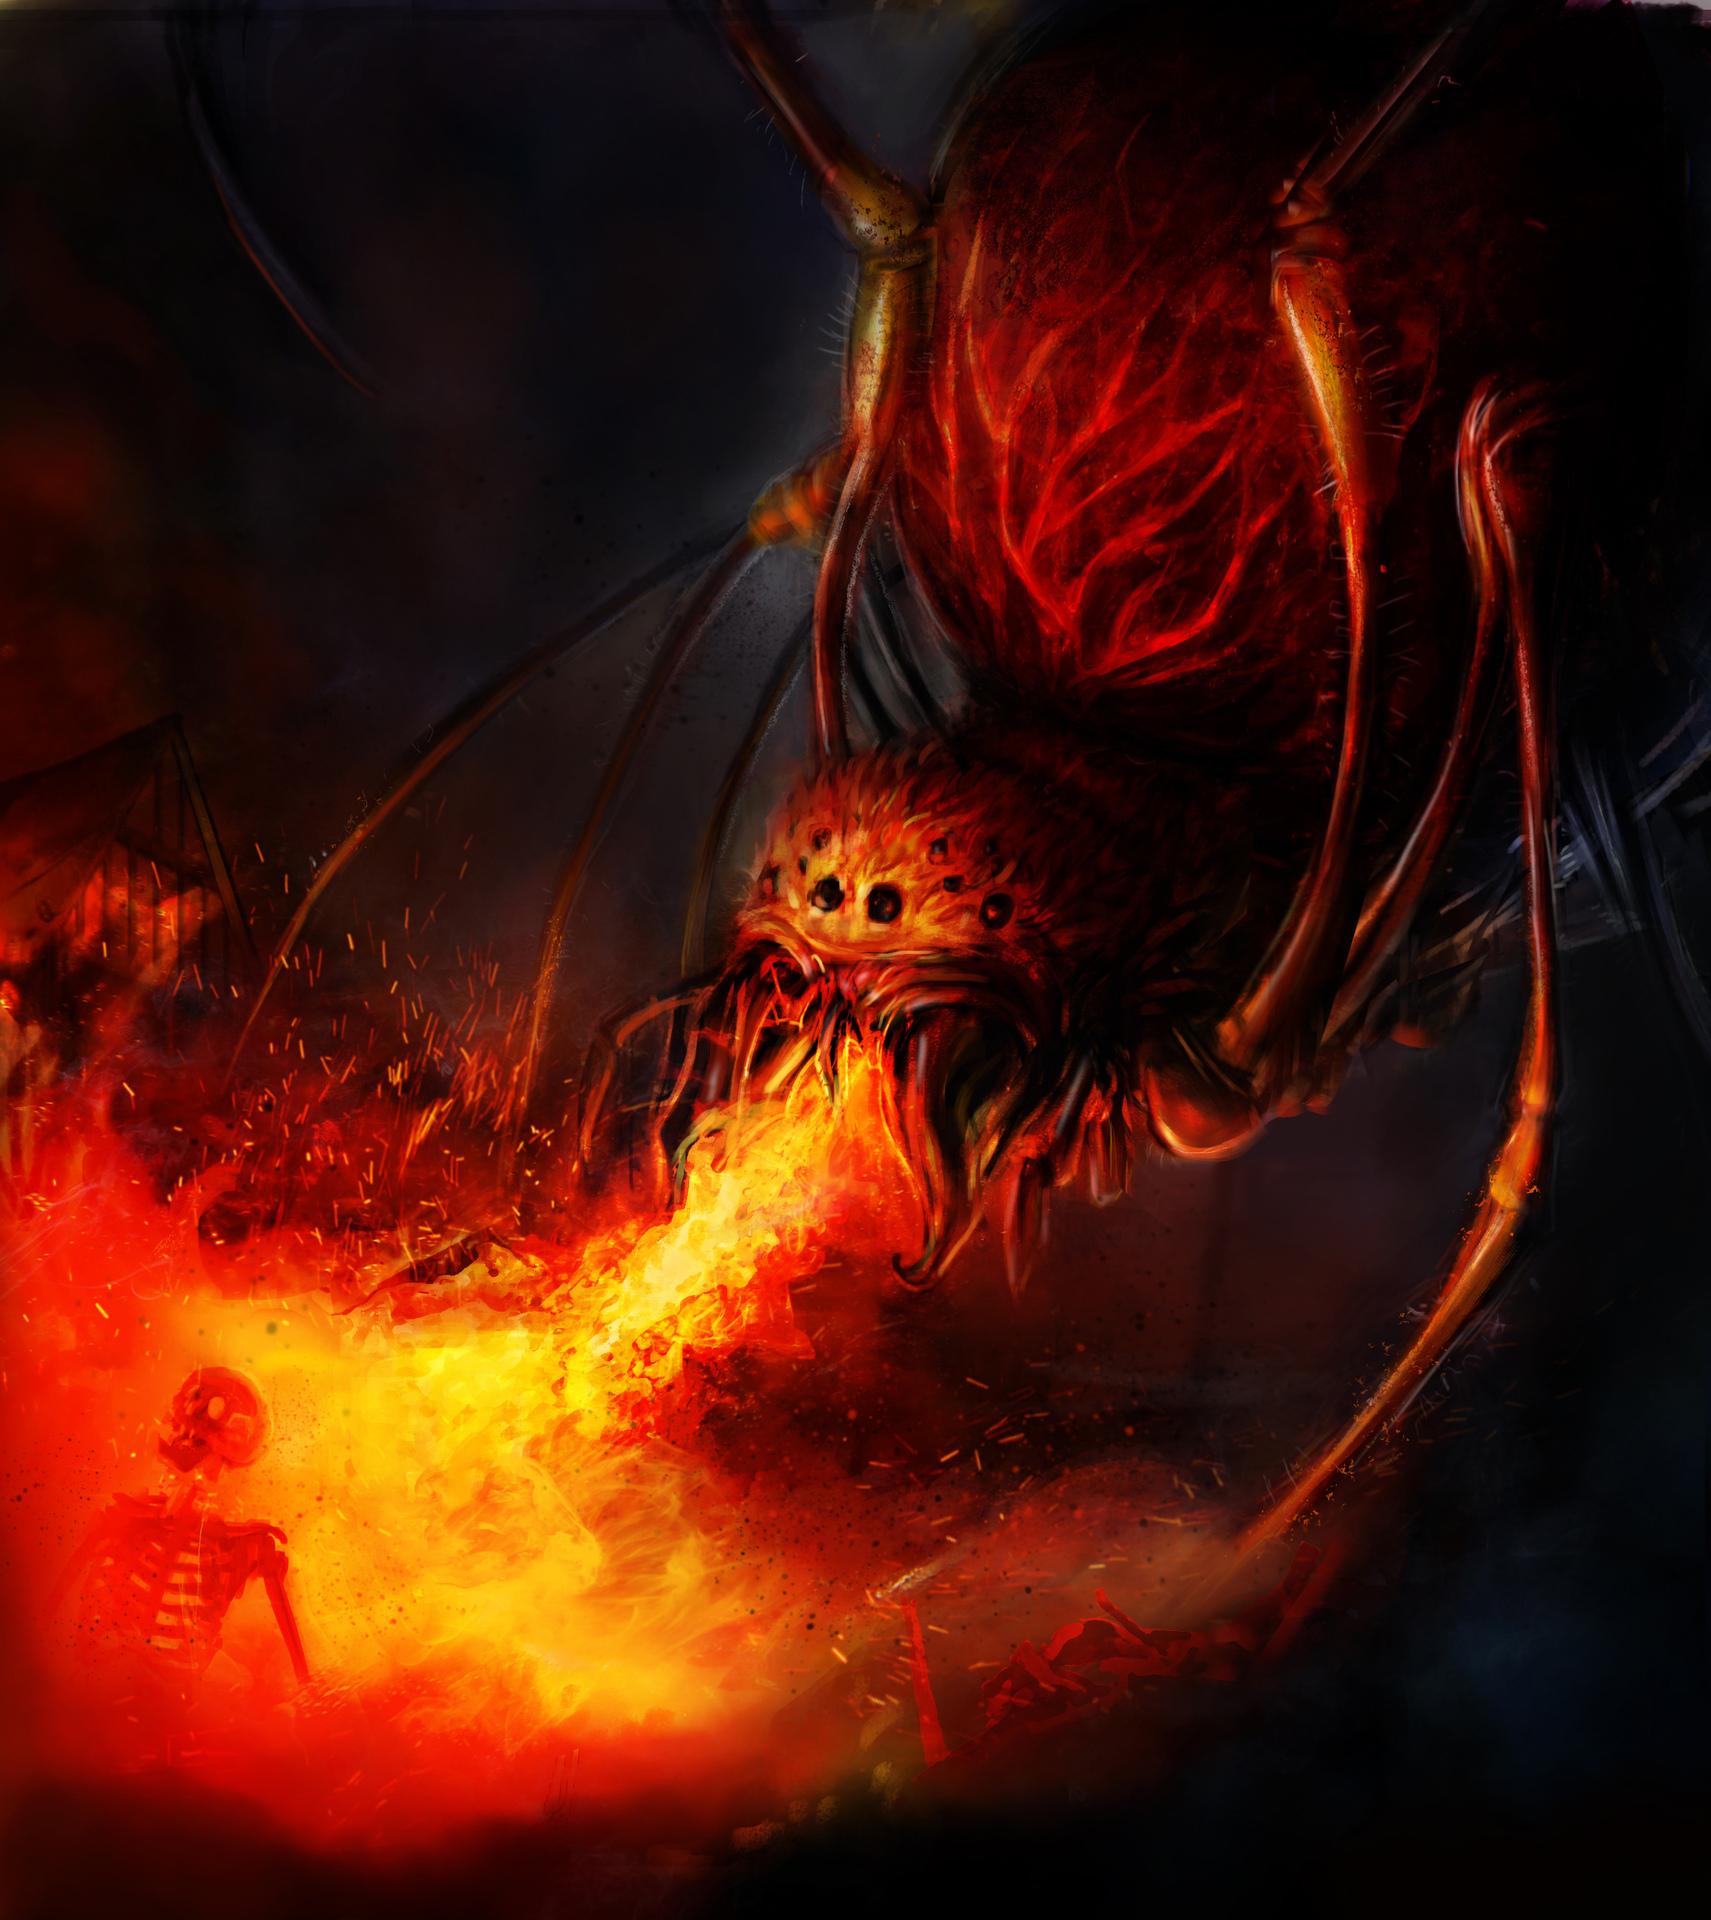 Spiderfirebreathv2